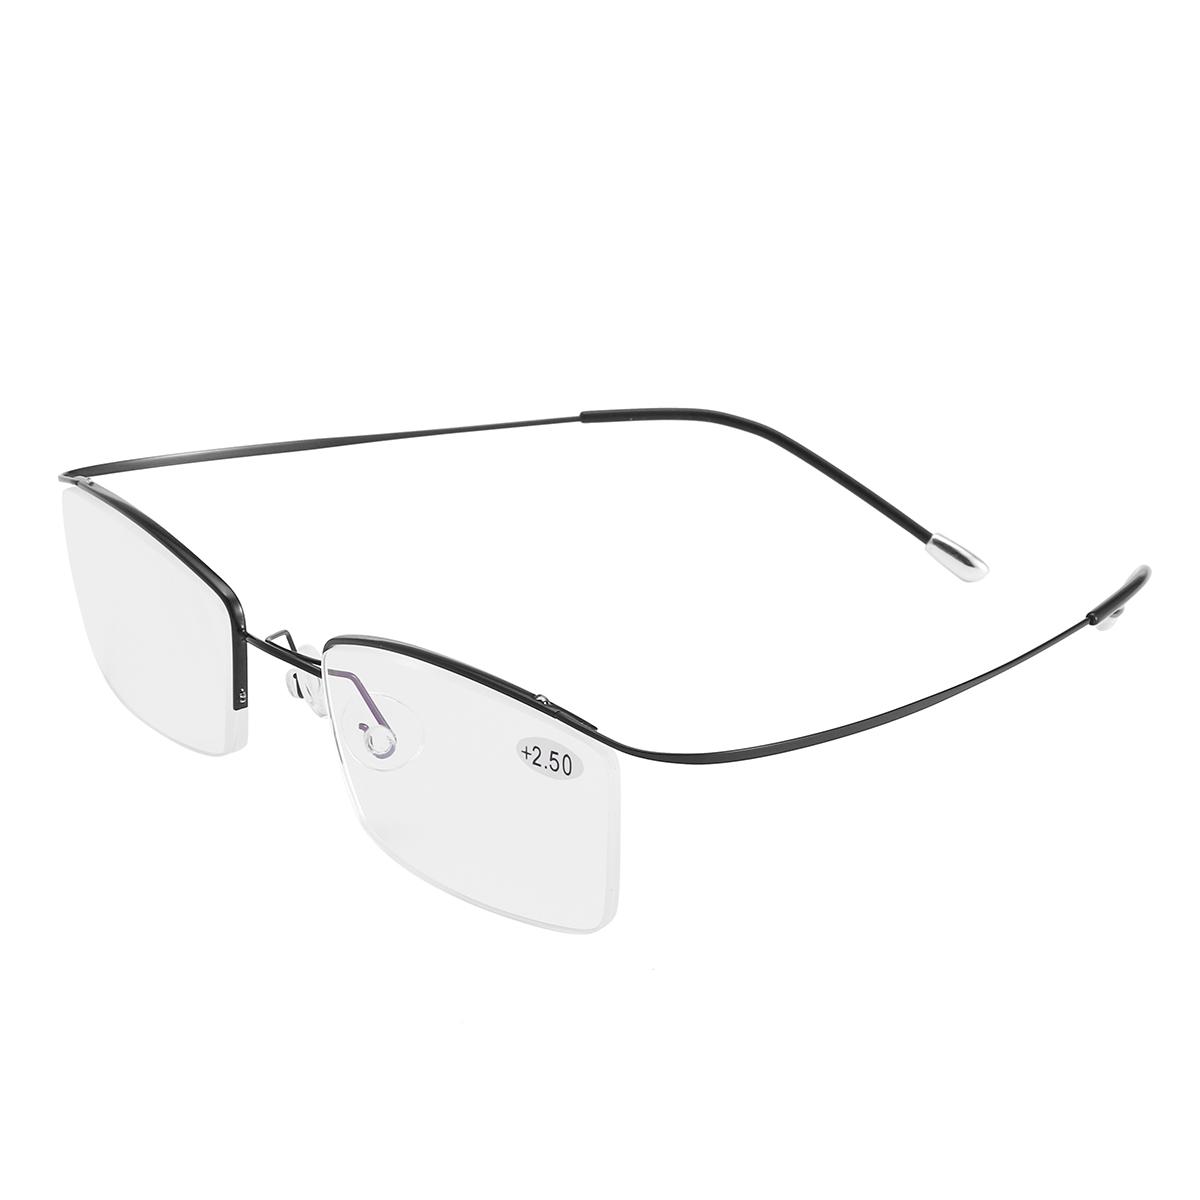 d23570fcef BRAODISION Presbyopic Reading Glasses HD Coated Resin Lens Flexible  Titanium Frame